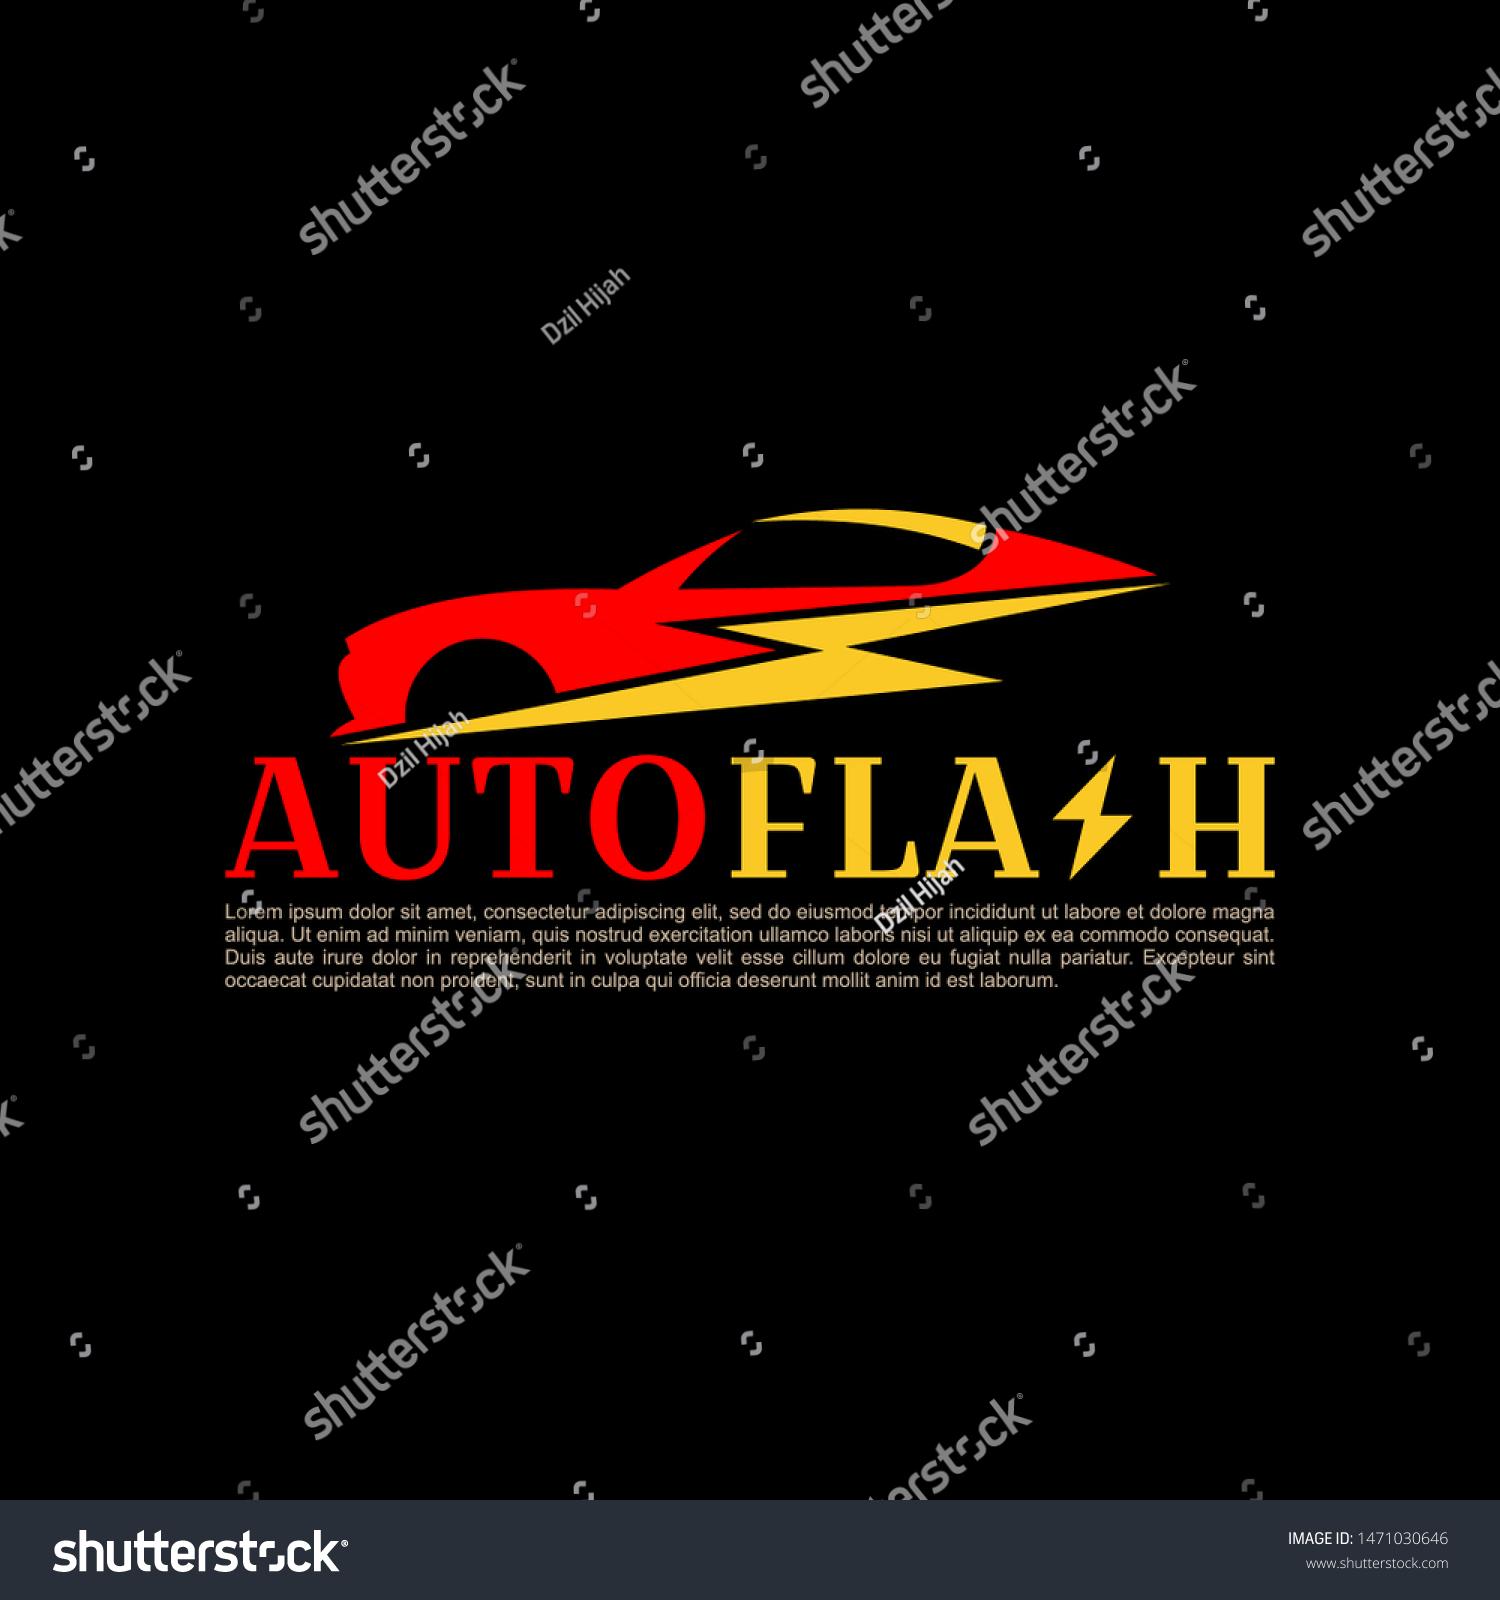 Auto Flash Car Business Logo Design Stock Vector Royalty Free 1471030646